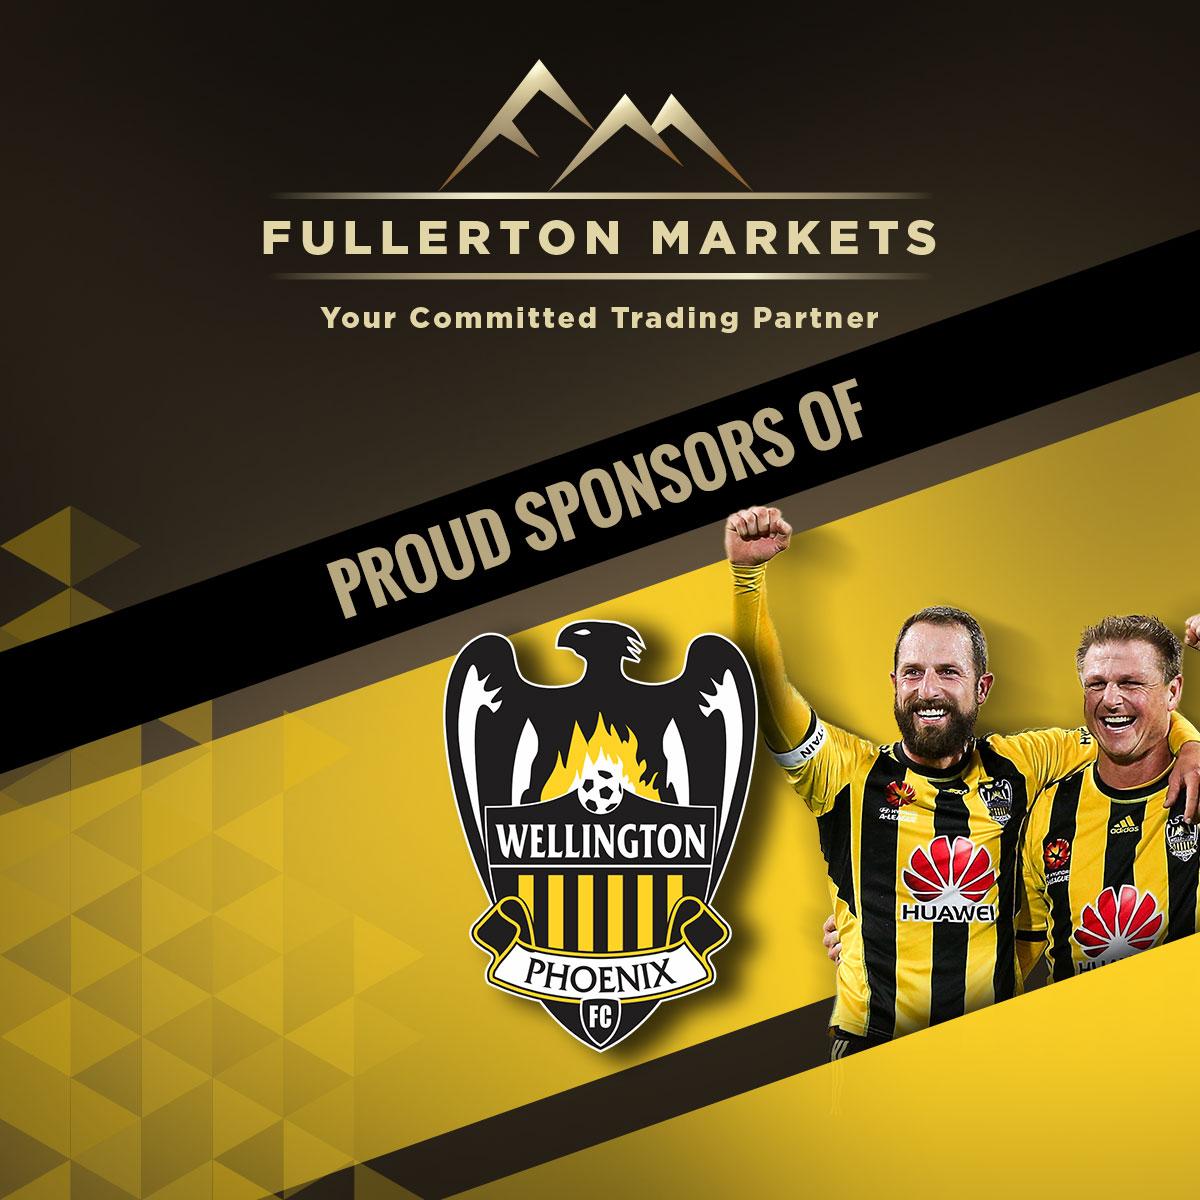 Proud Sponsors of Wellington Phoenix Football Club